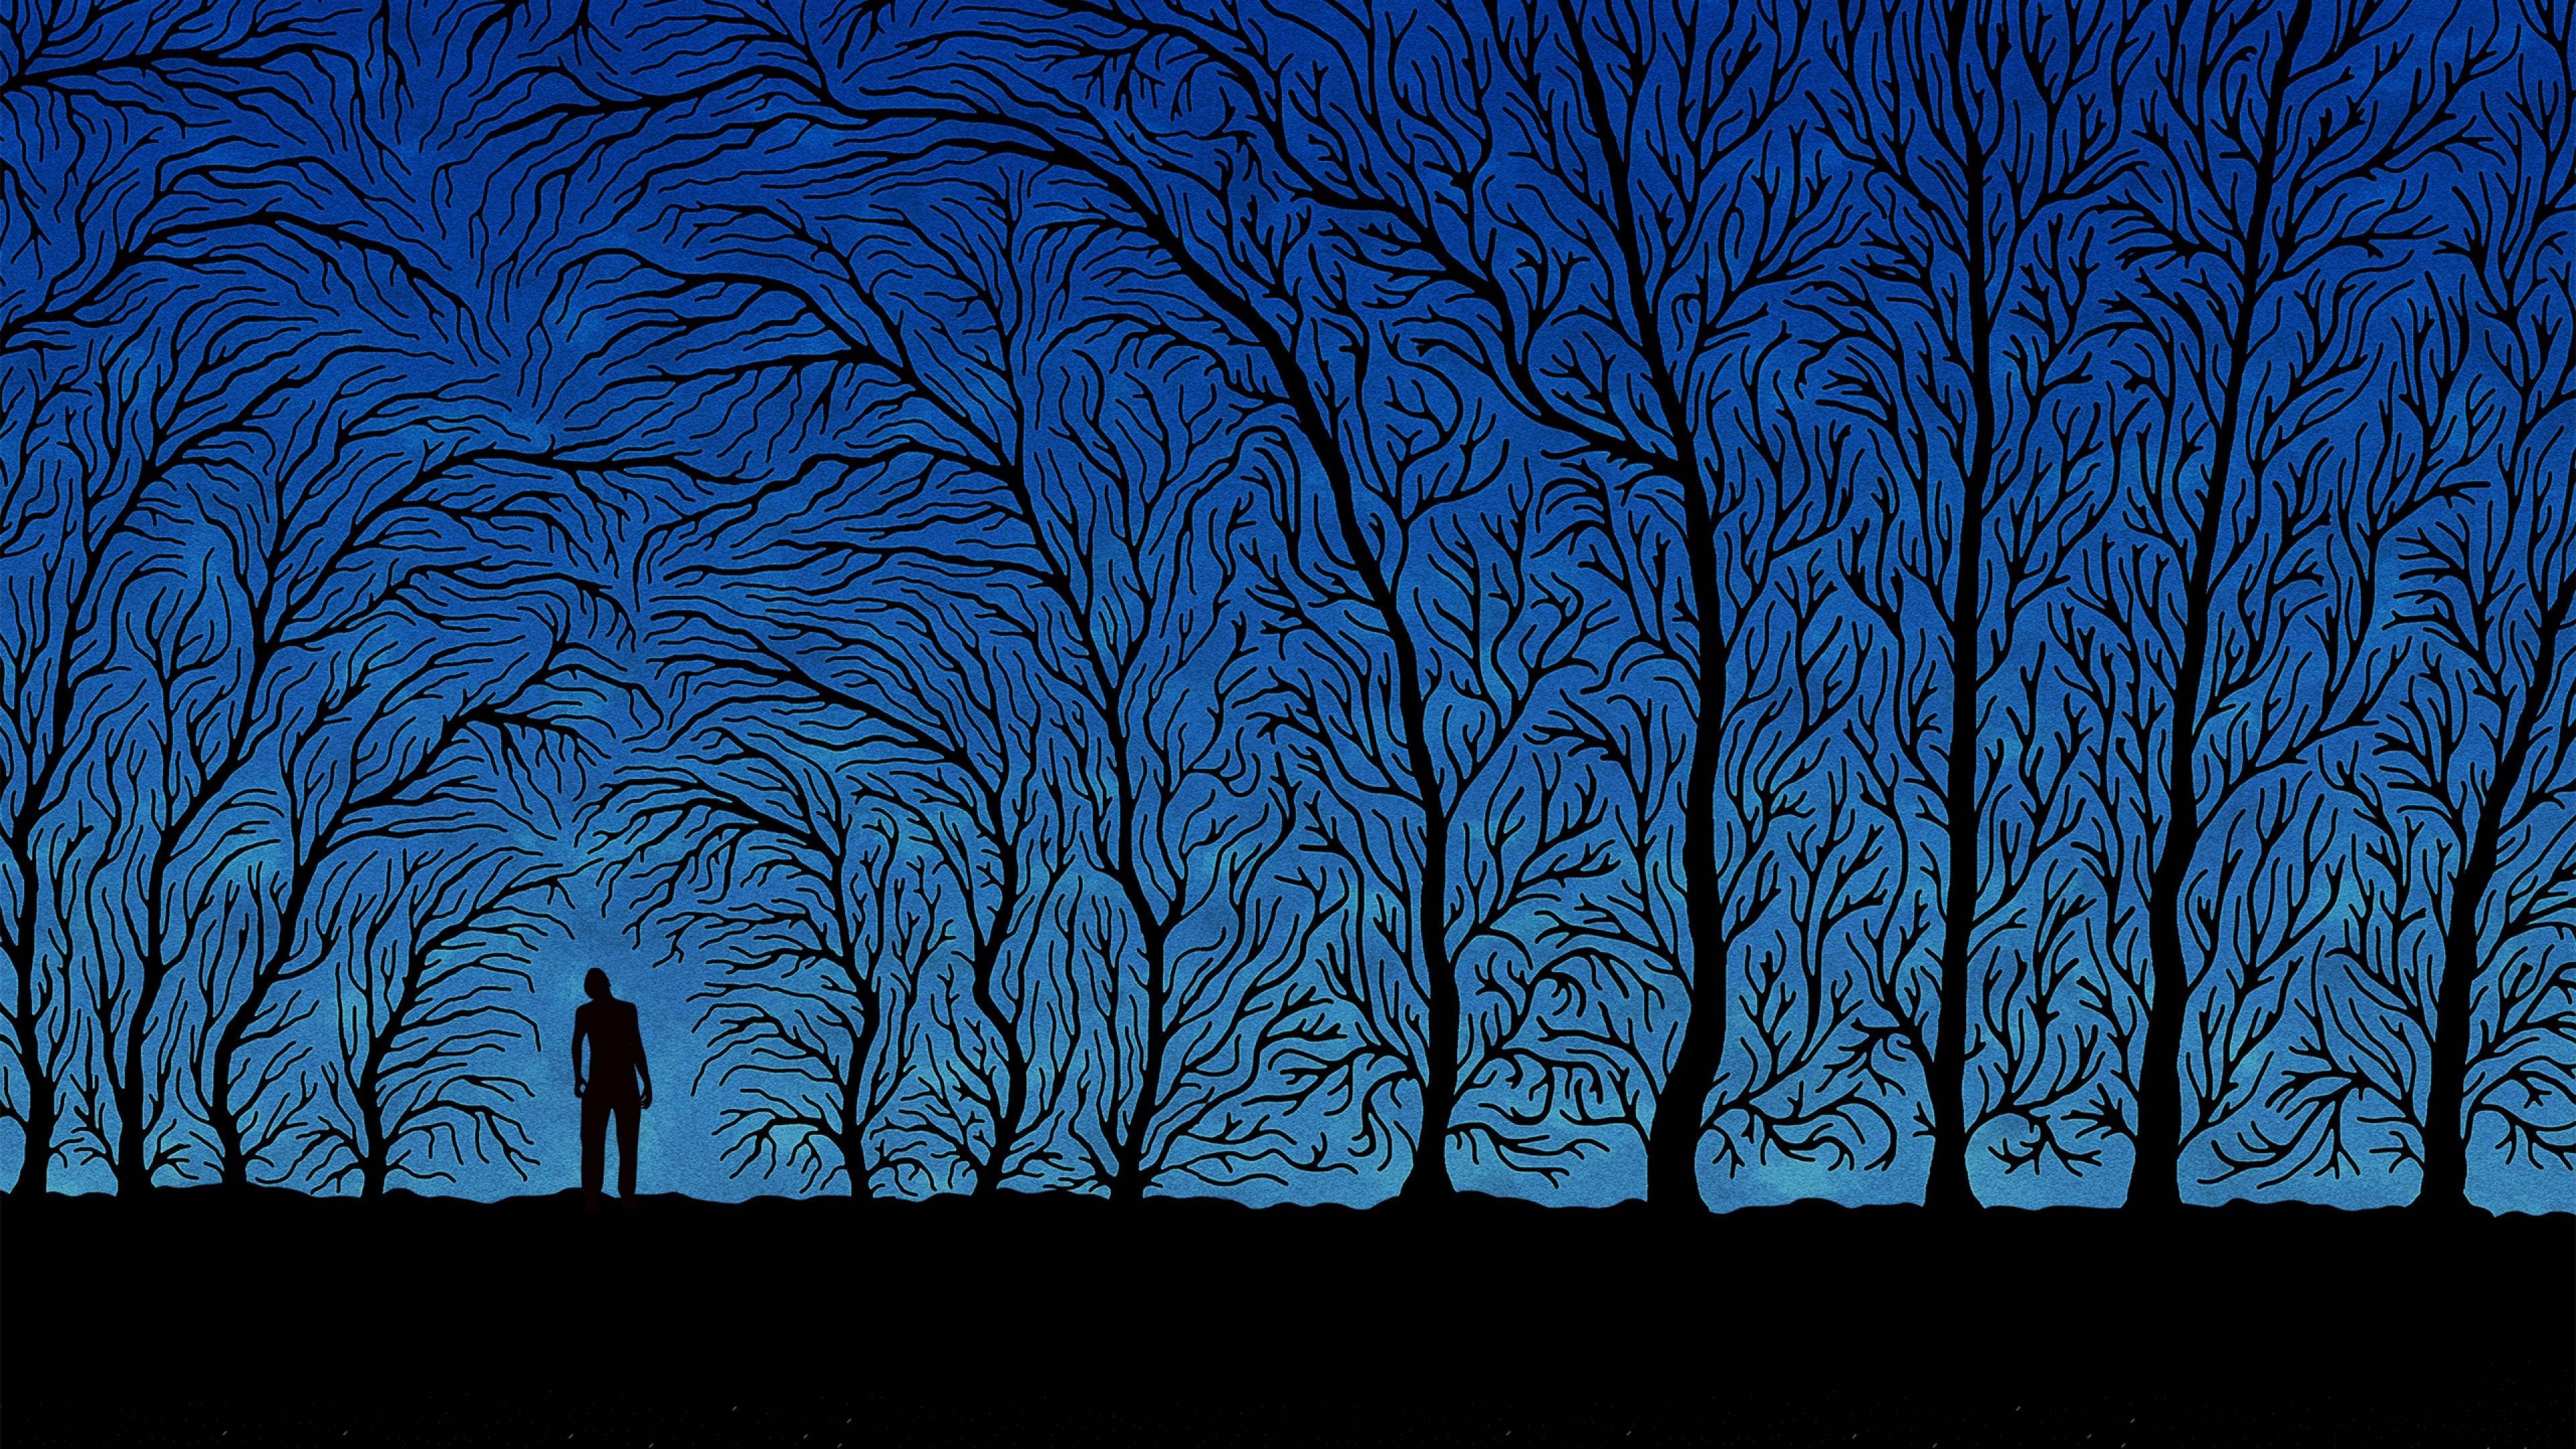 trees art 4k 1540748390 - Trees Art 4k - vector wallpapers, trees wallpapers, digital art wallpapers, artist wallpapers, art wallpapers